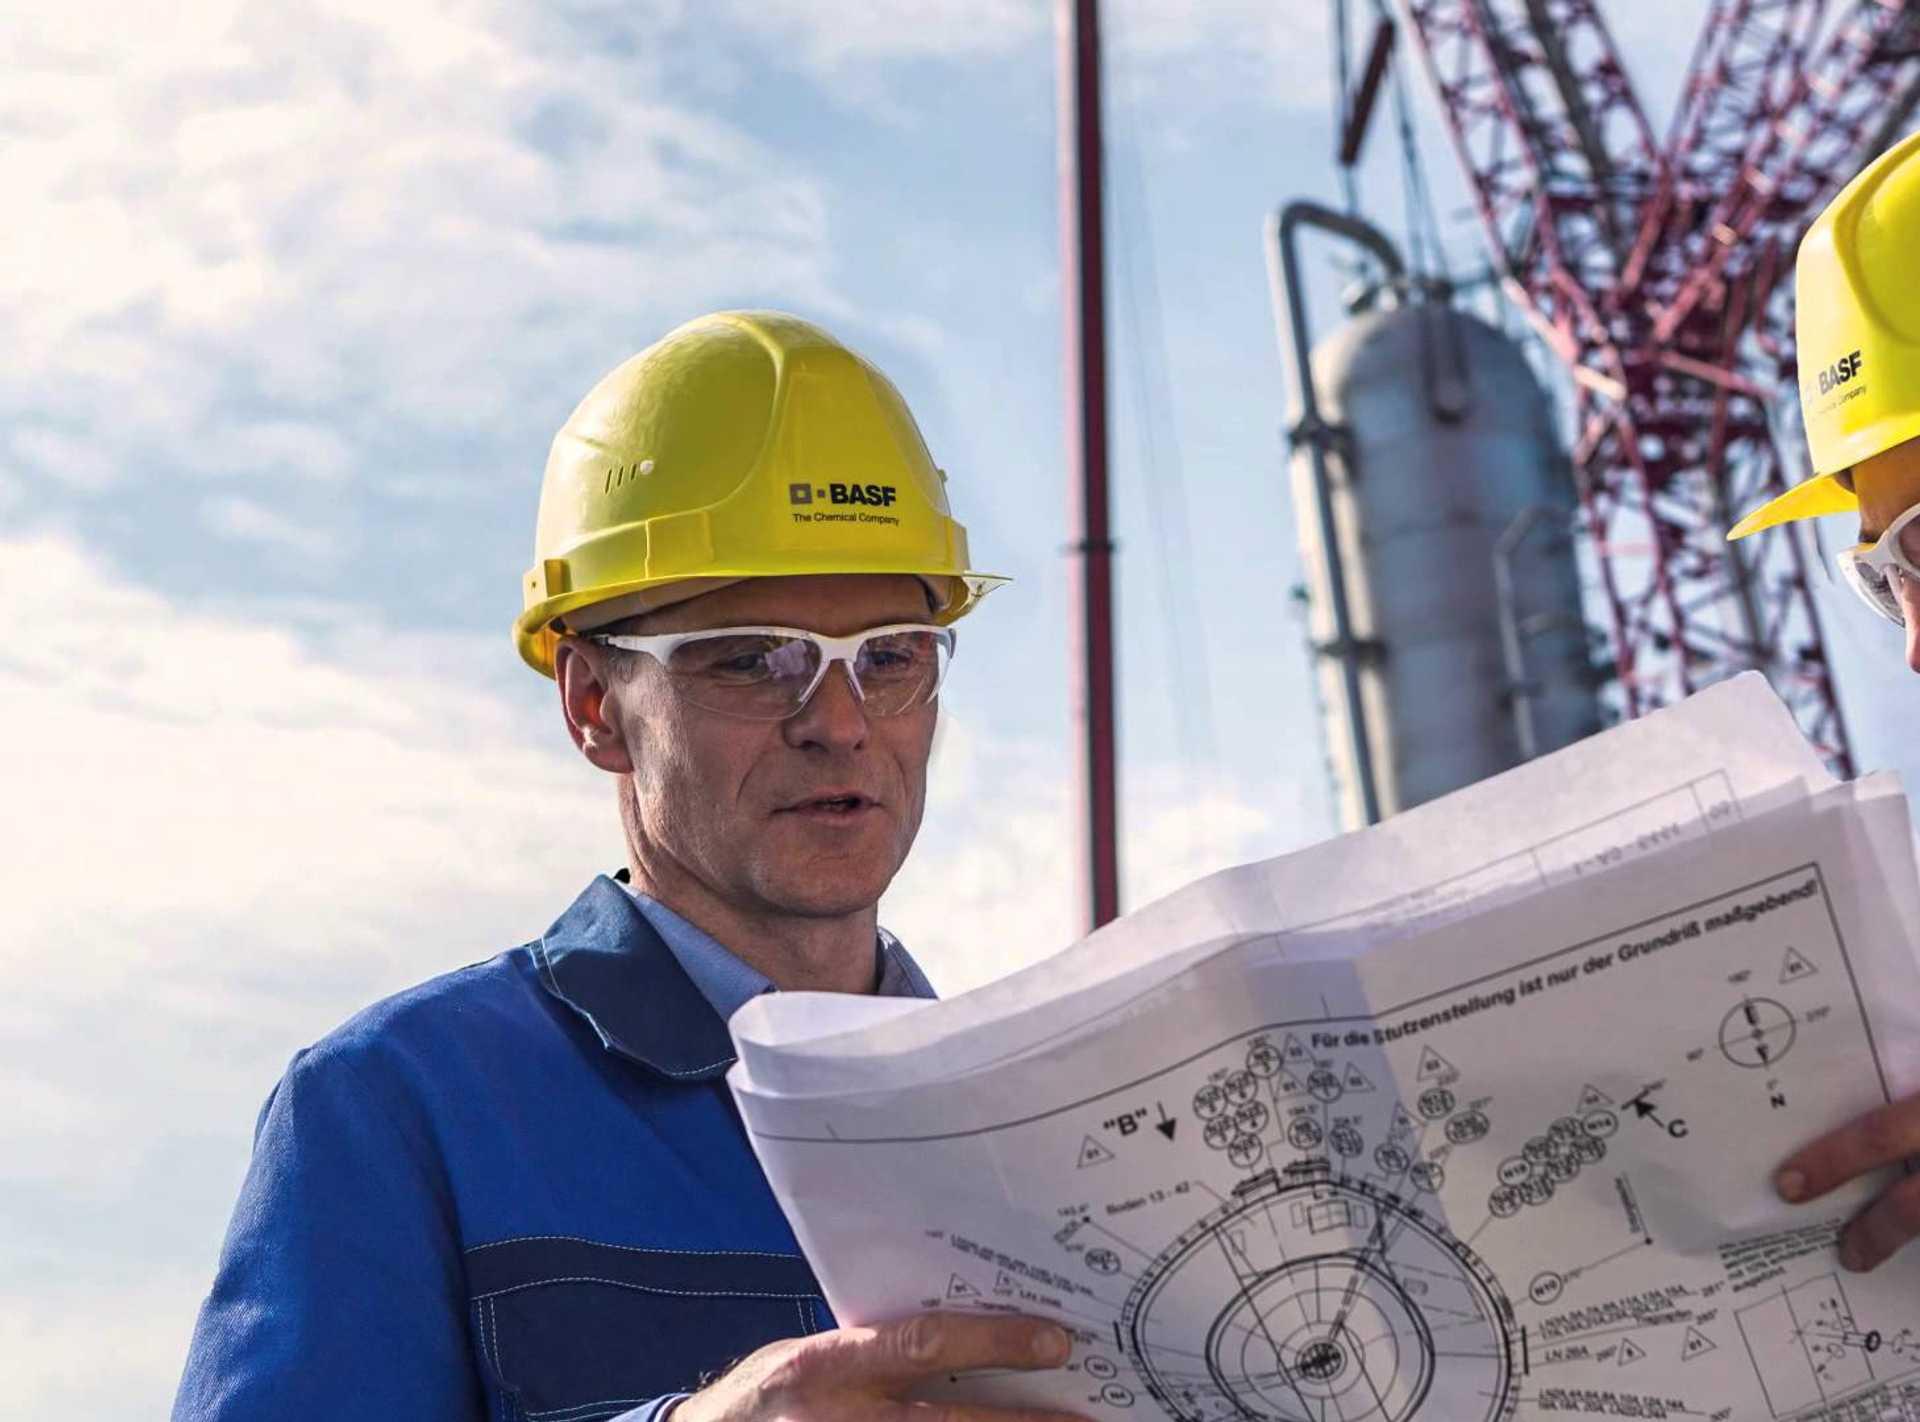 Accruent - Resources - Case Studies - BASF - Hero